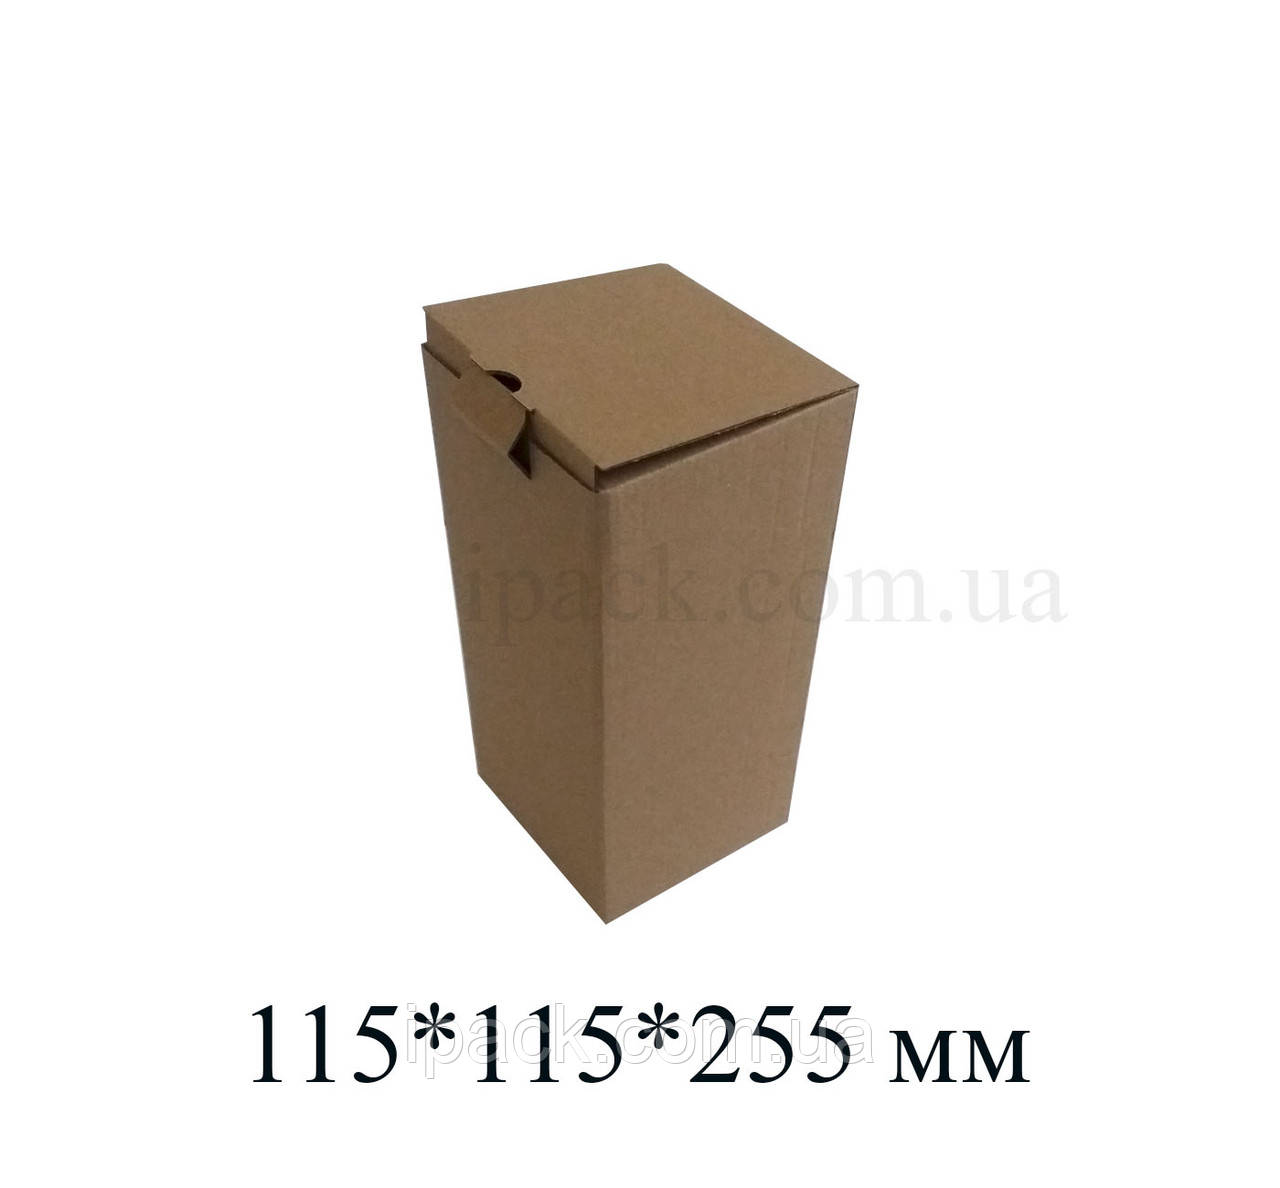 Коробка картонная самосборная, 115*115*255, мм, бурая, крафт, микрогофрокартон